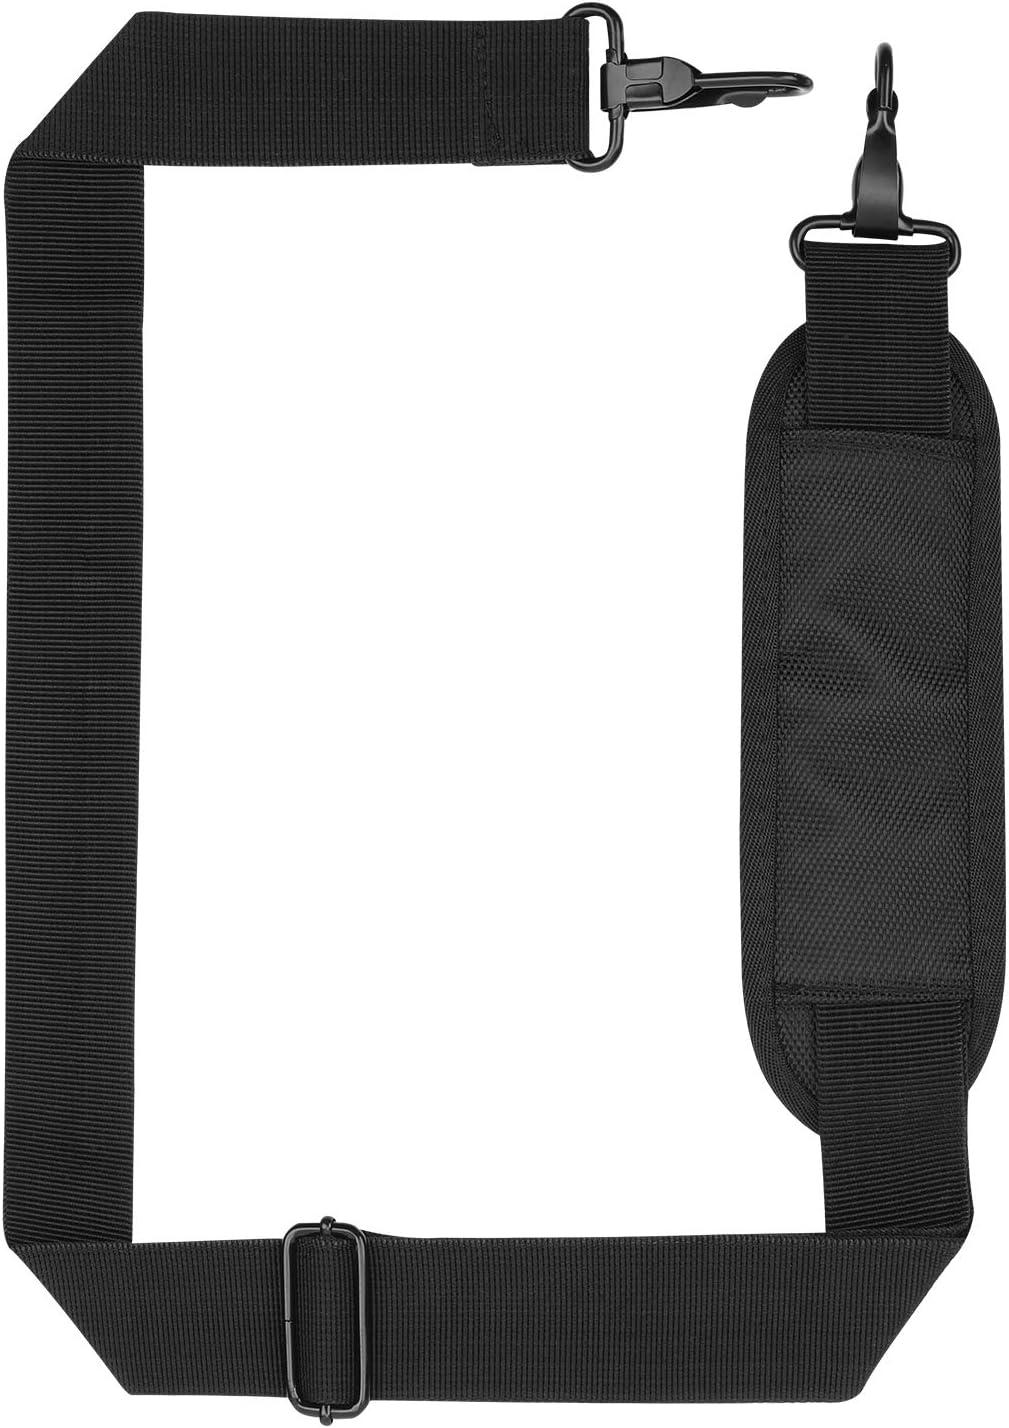 Zokaliy Laptop Shoulder Strap Replacement, Universal Replacement Luggage Duffel Bag Strap Adjustable Belt with Pad&Metal Hooks for Briefcase Computer Crossbody Messenger Diaper Bag Laptop Case, Black